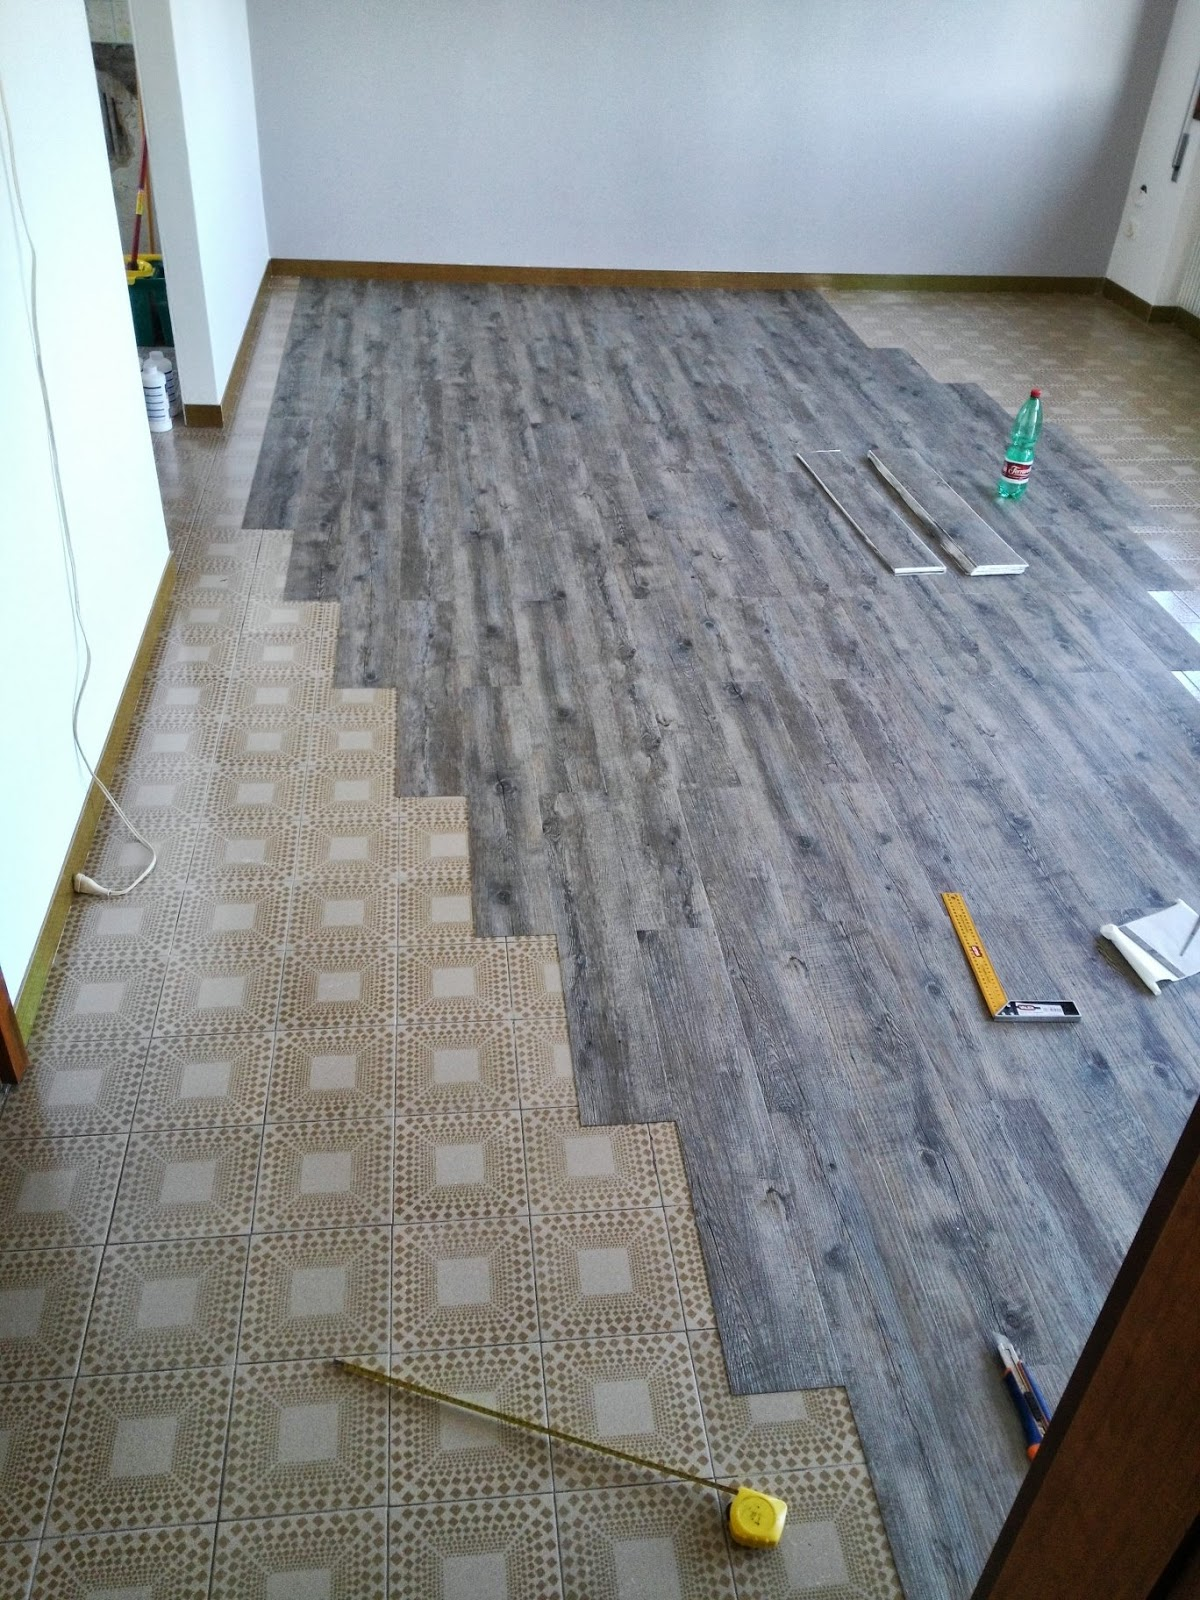 pavimento pvc adesivo leroy merlin confortevole. Black Bedroom Furniture Sets. Home Design Ideas